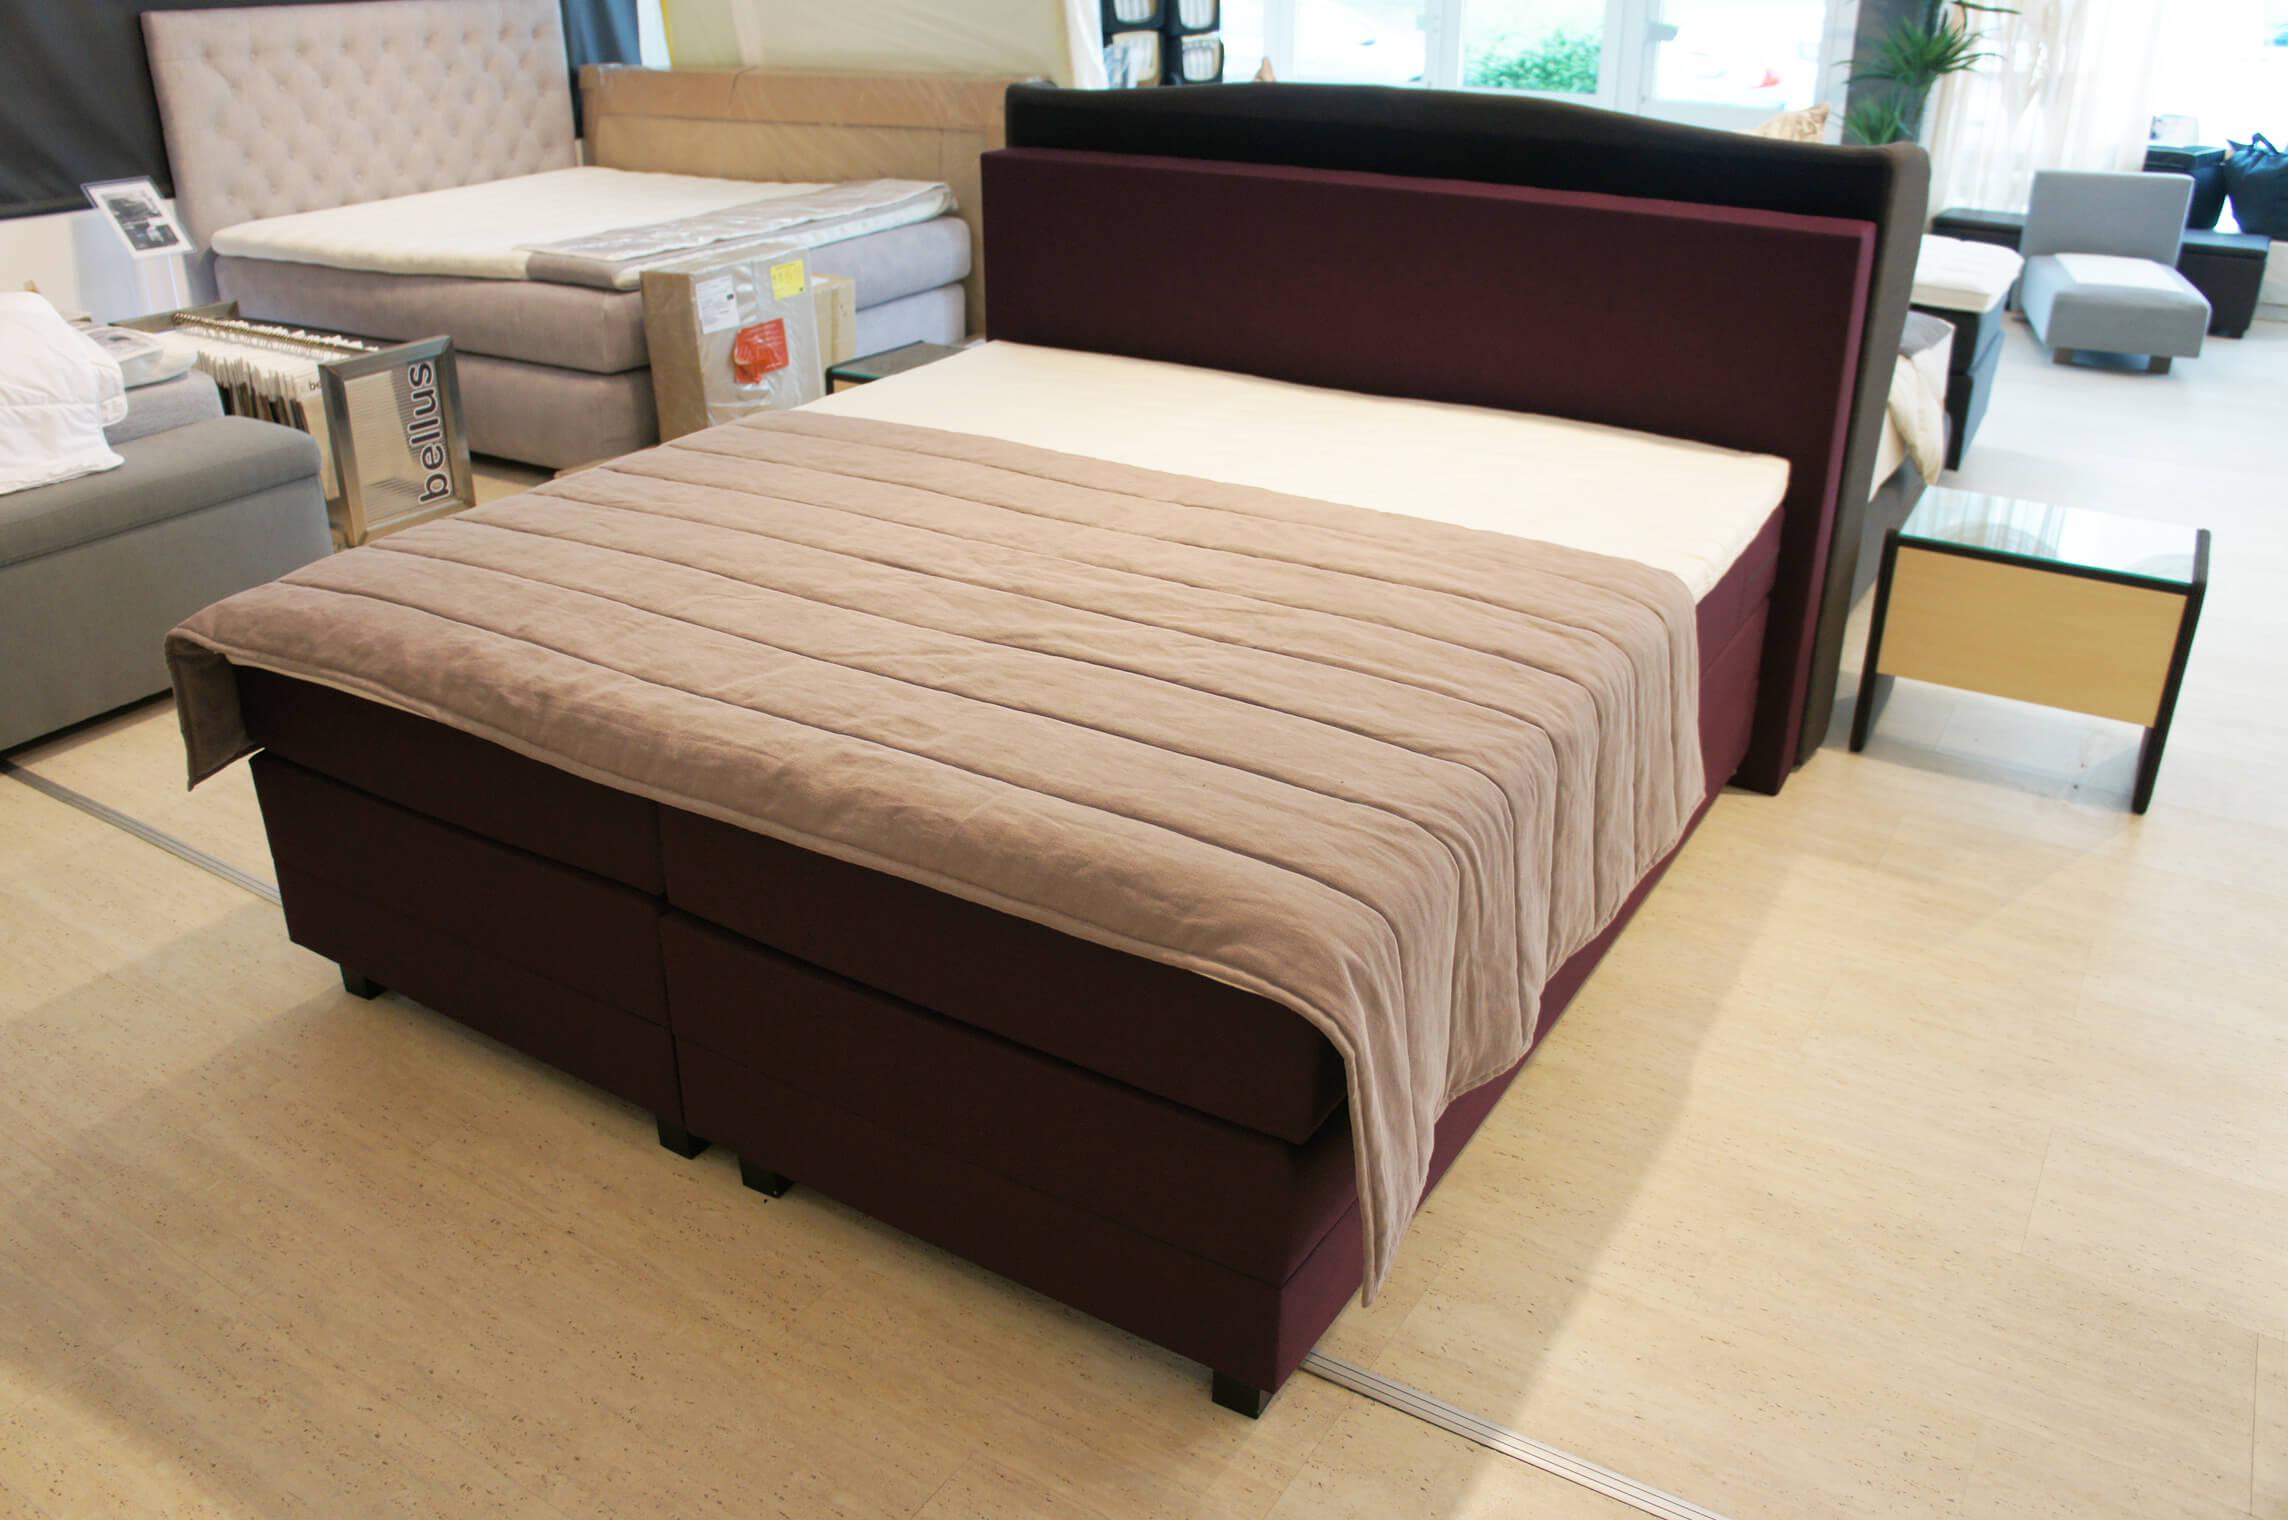 boxspringbetten k ln mit best preis garantie bei moonlight. Black Bedroom Furniture Sets. Home Design Ideas